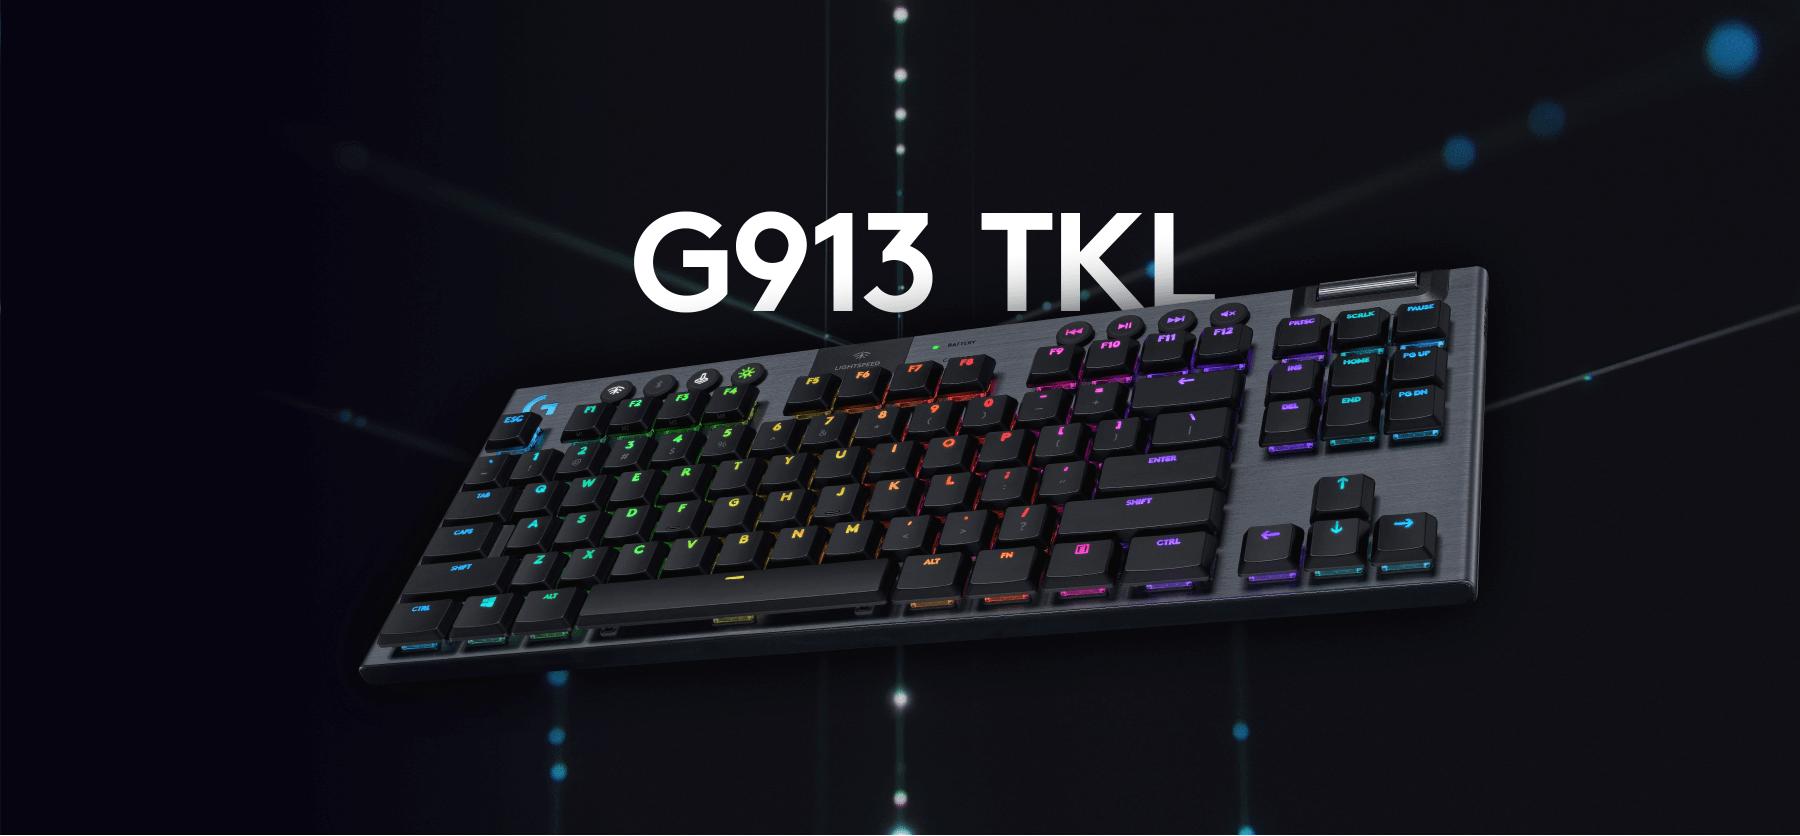 Logitech G913 TKL